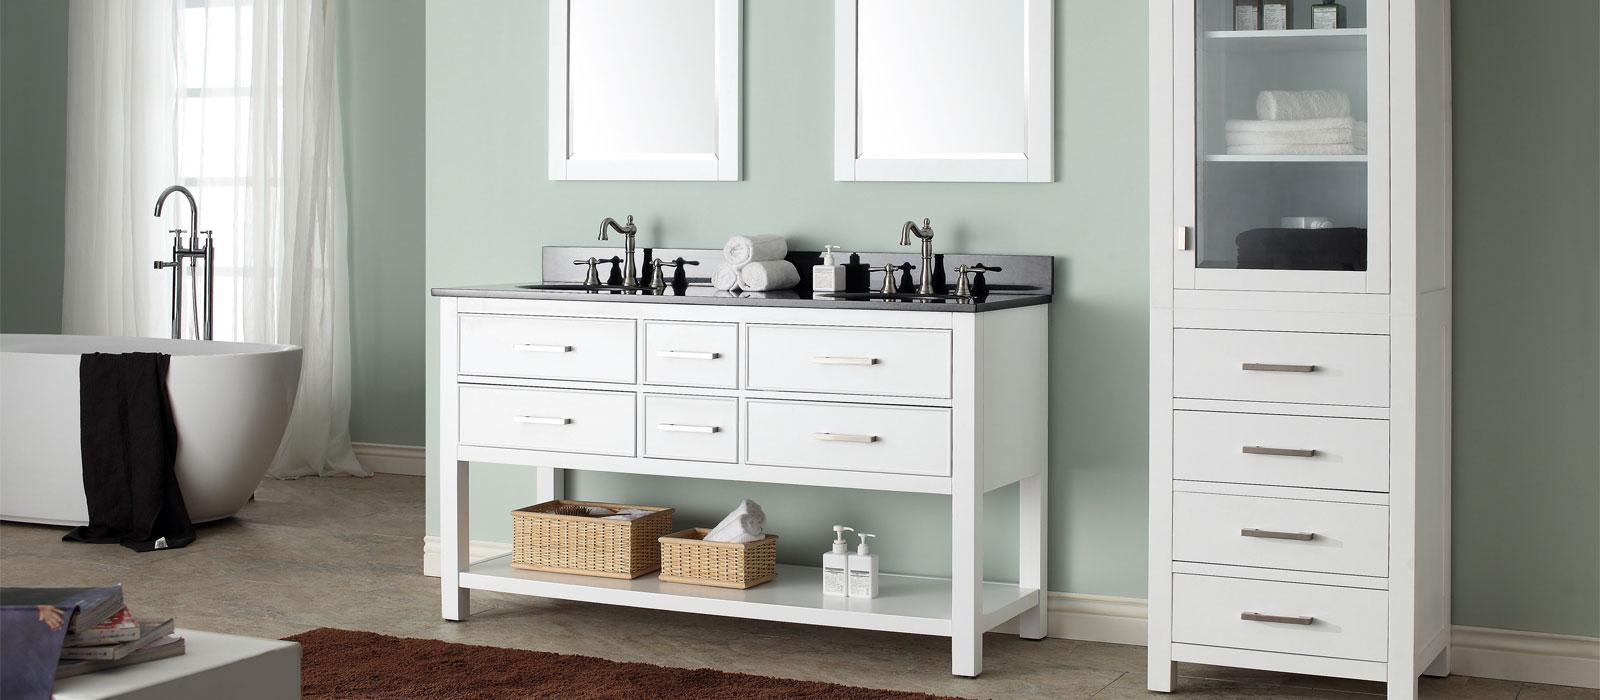 bathroom vanities north hollywood - polaris home design